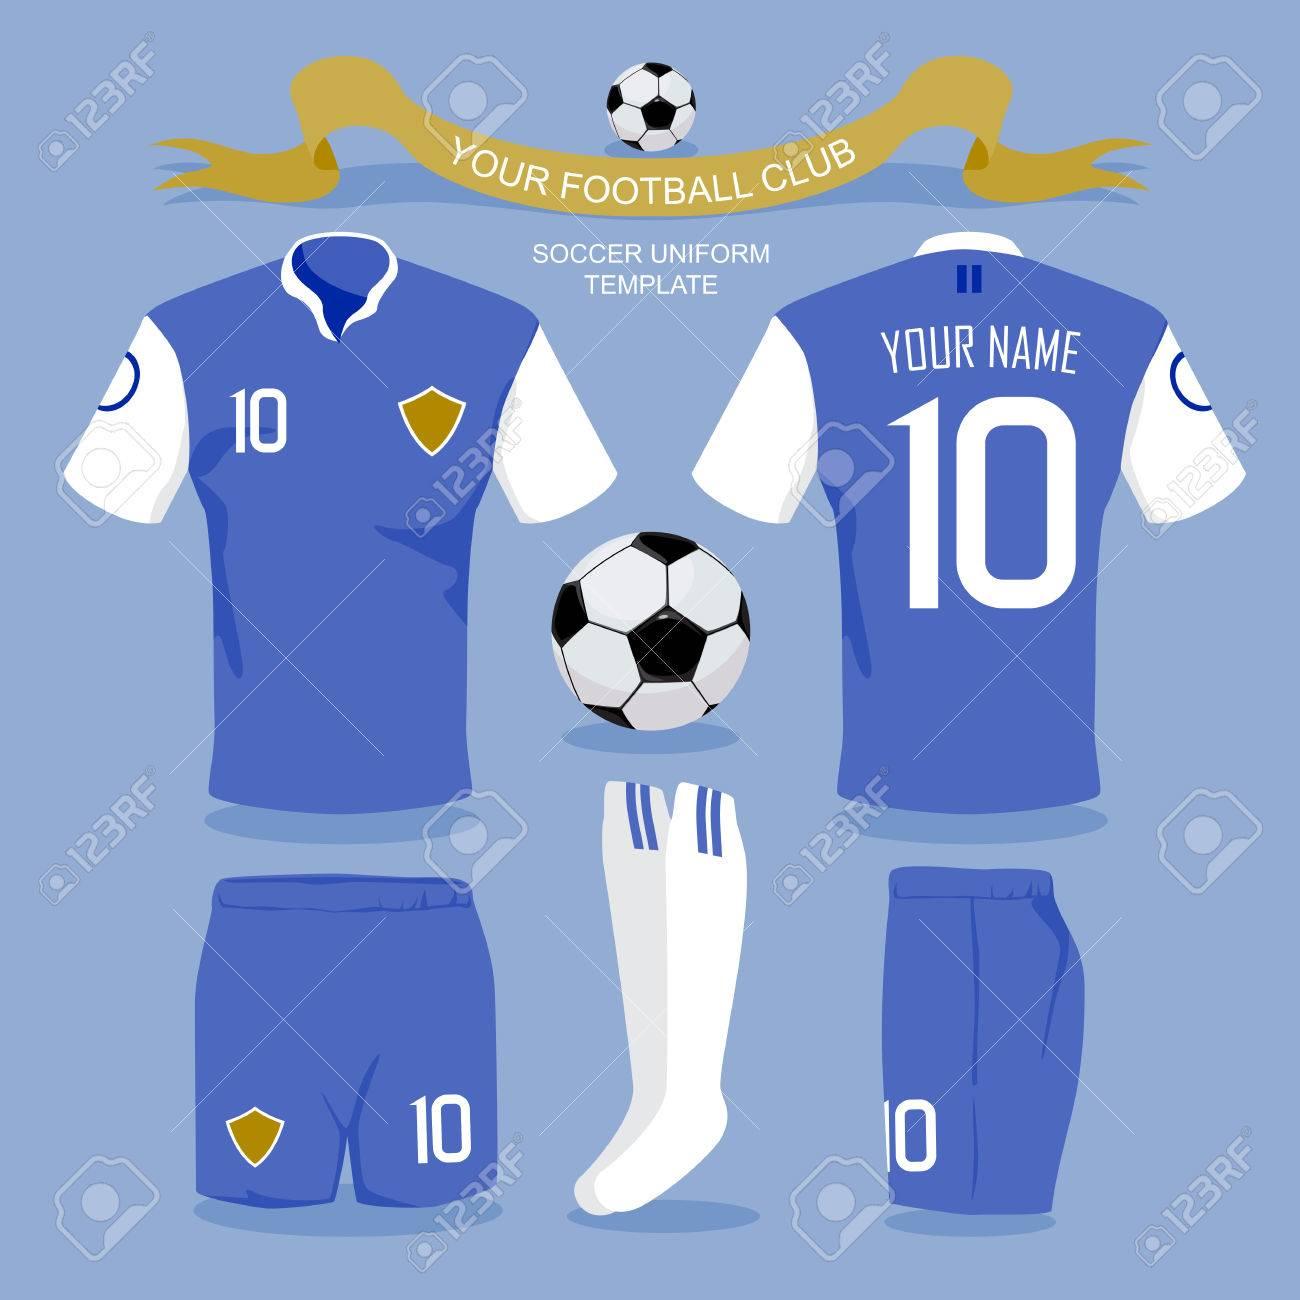 Shirt uniform design vector - Soccer Uniform Template For Your Football Club Illustration Design Stock Vector 40044329